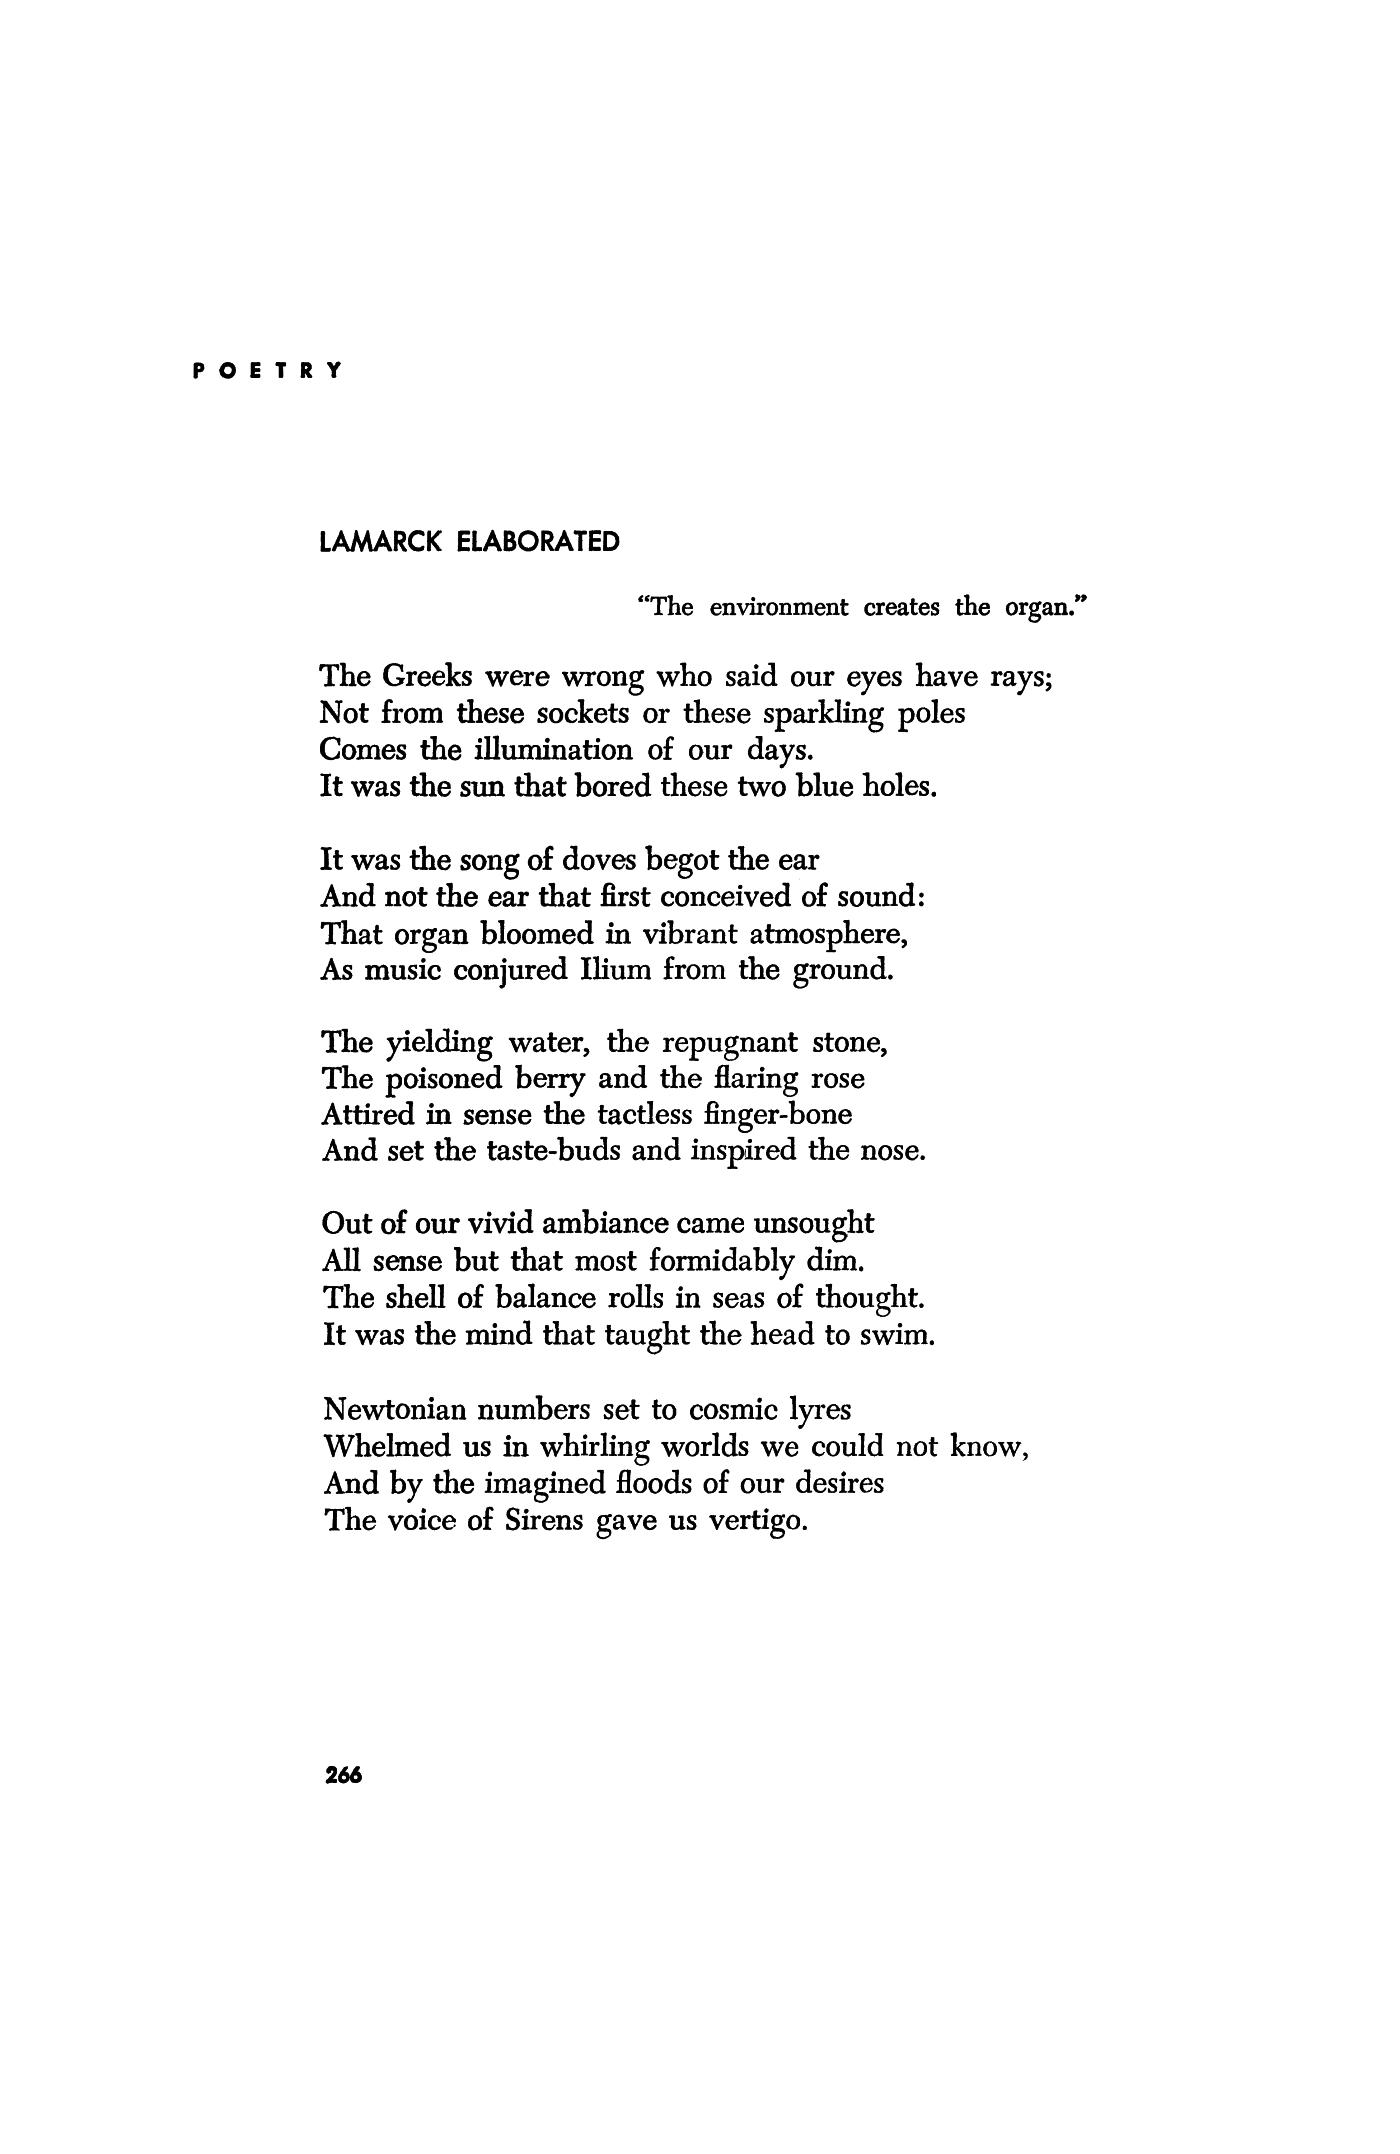 Richard Wilbur lamarck elaborated